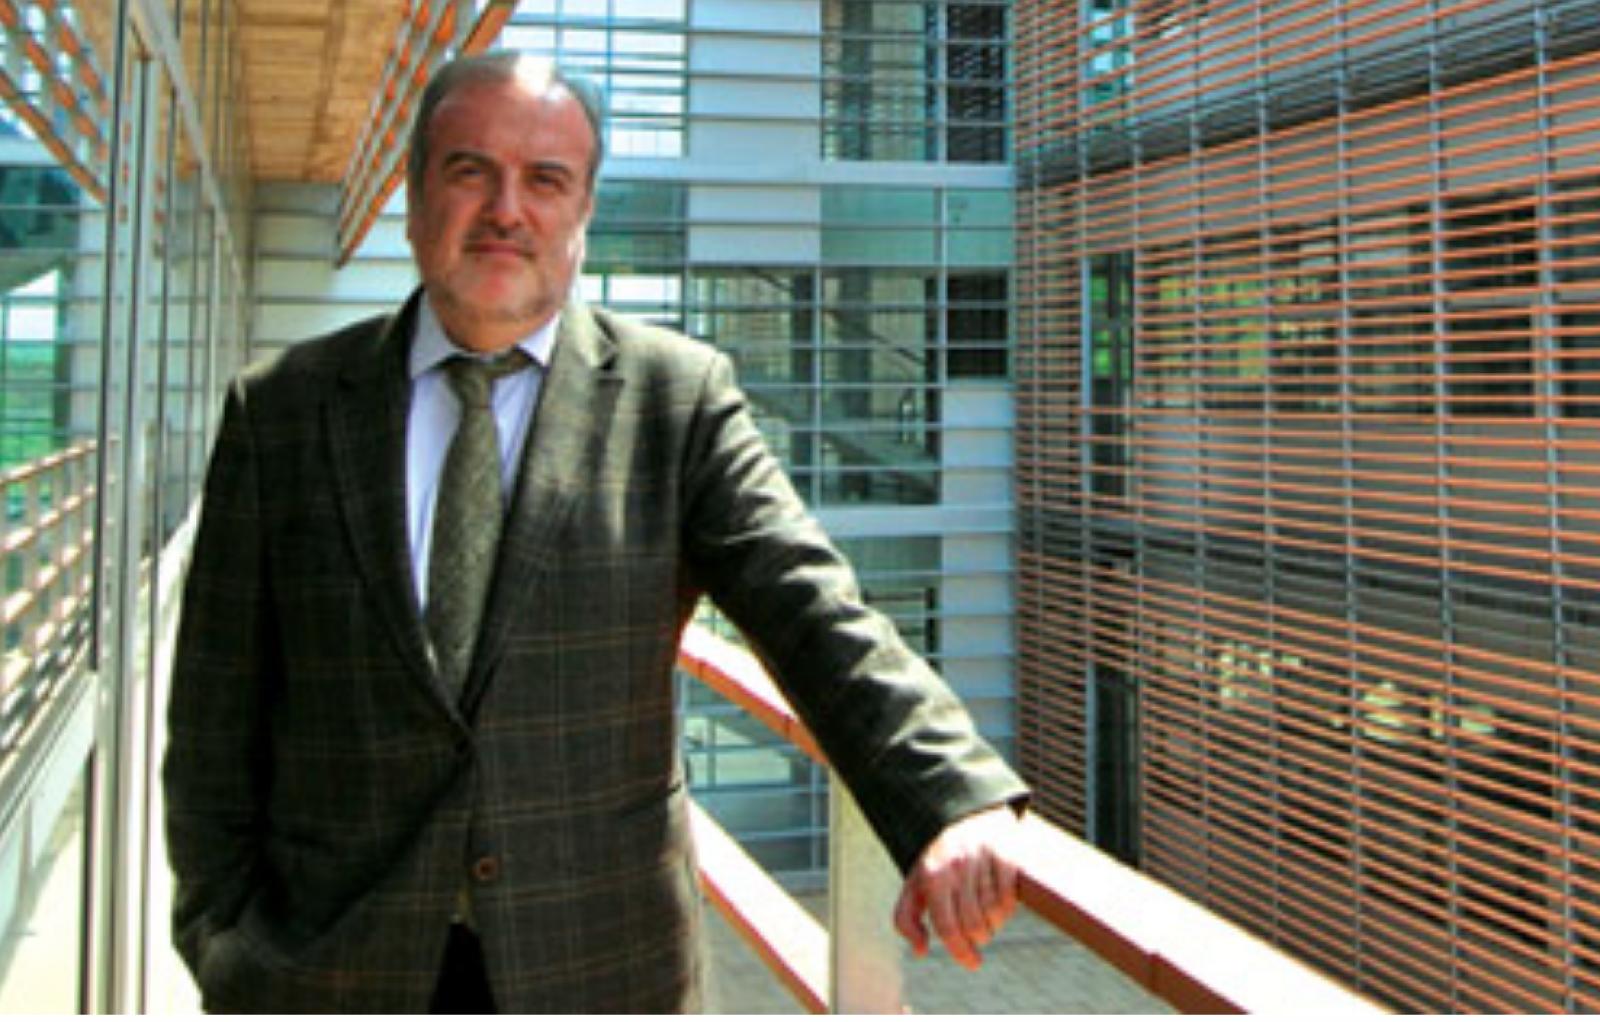 Damià Barceló, director de l'Institut de Recerca de l'Aigua